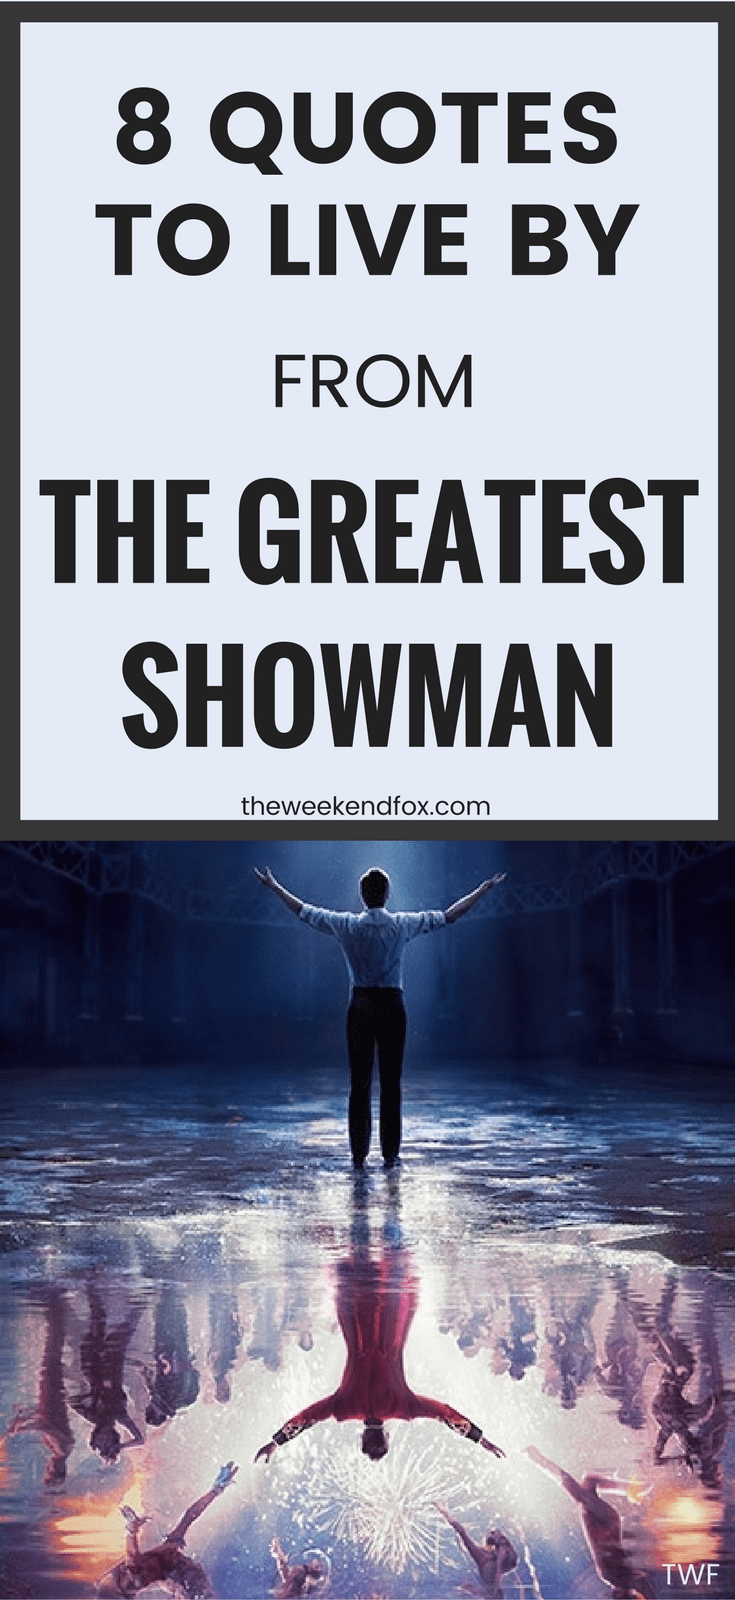 The greatest showman quotes greatest showman movie movie quotes inspiration moviequotes greatestshowman hughjackman zacefron zendaya